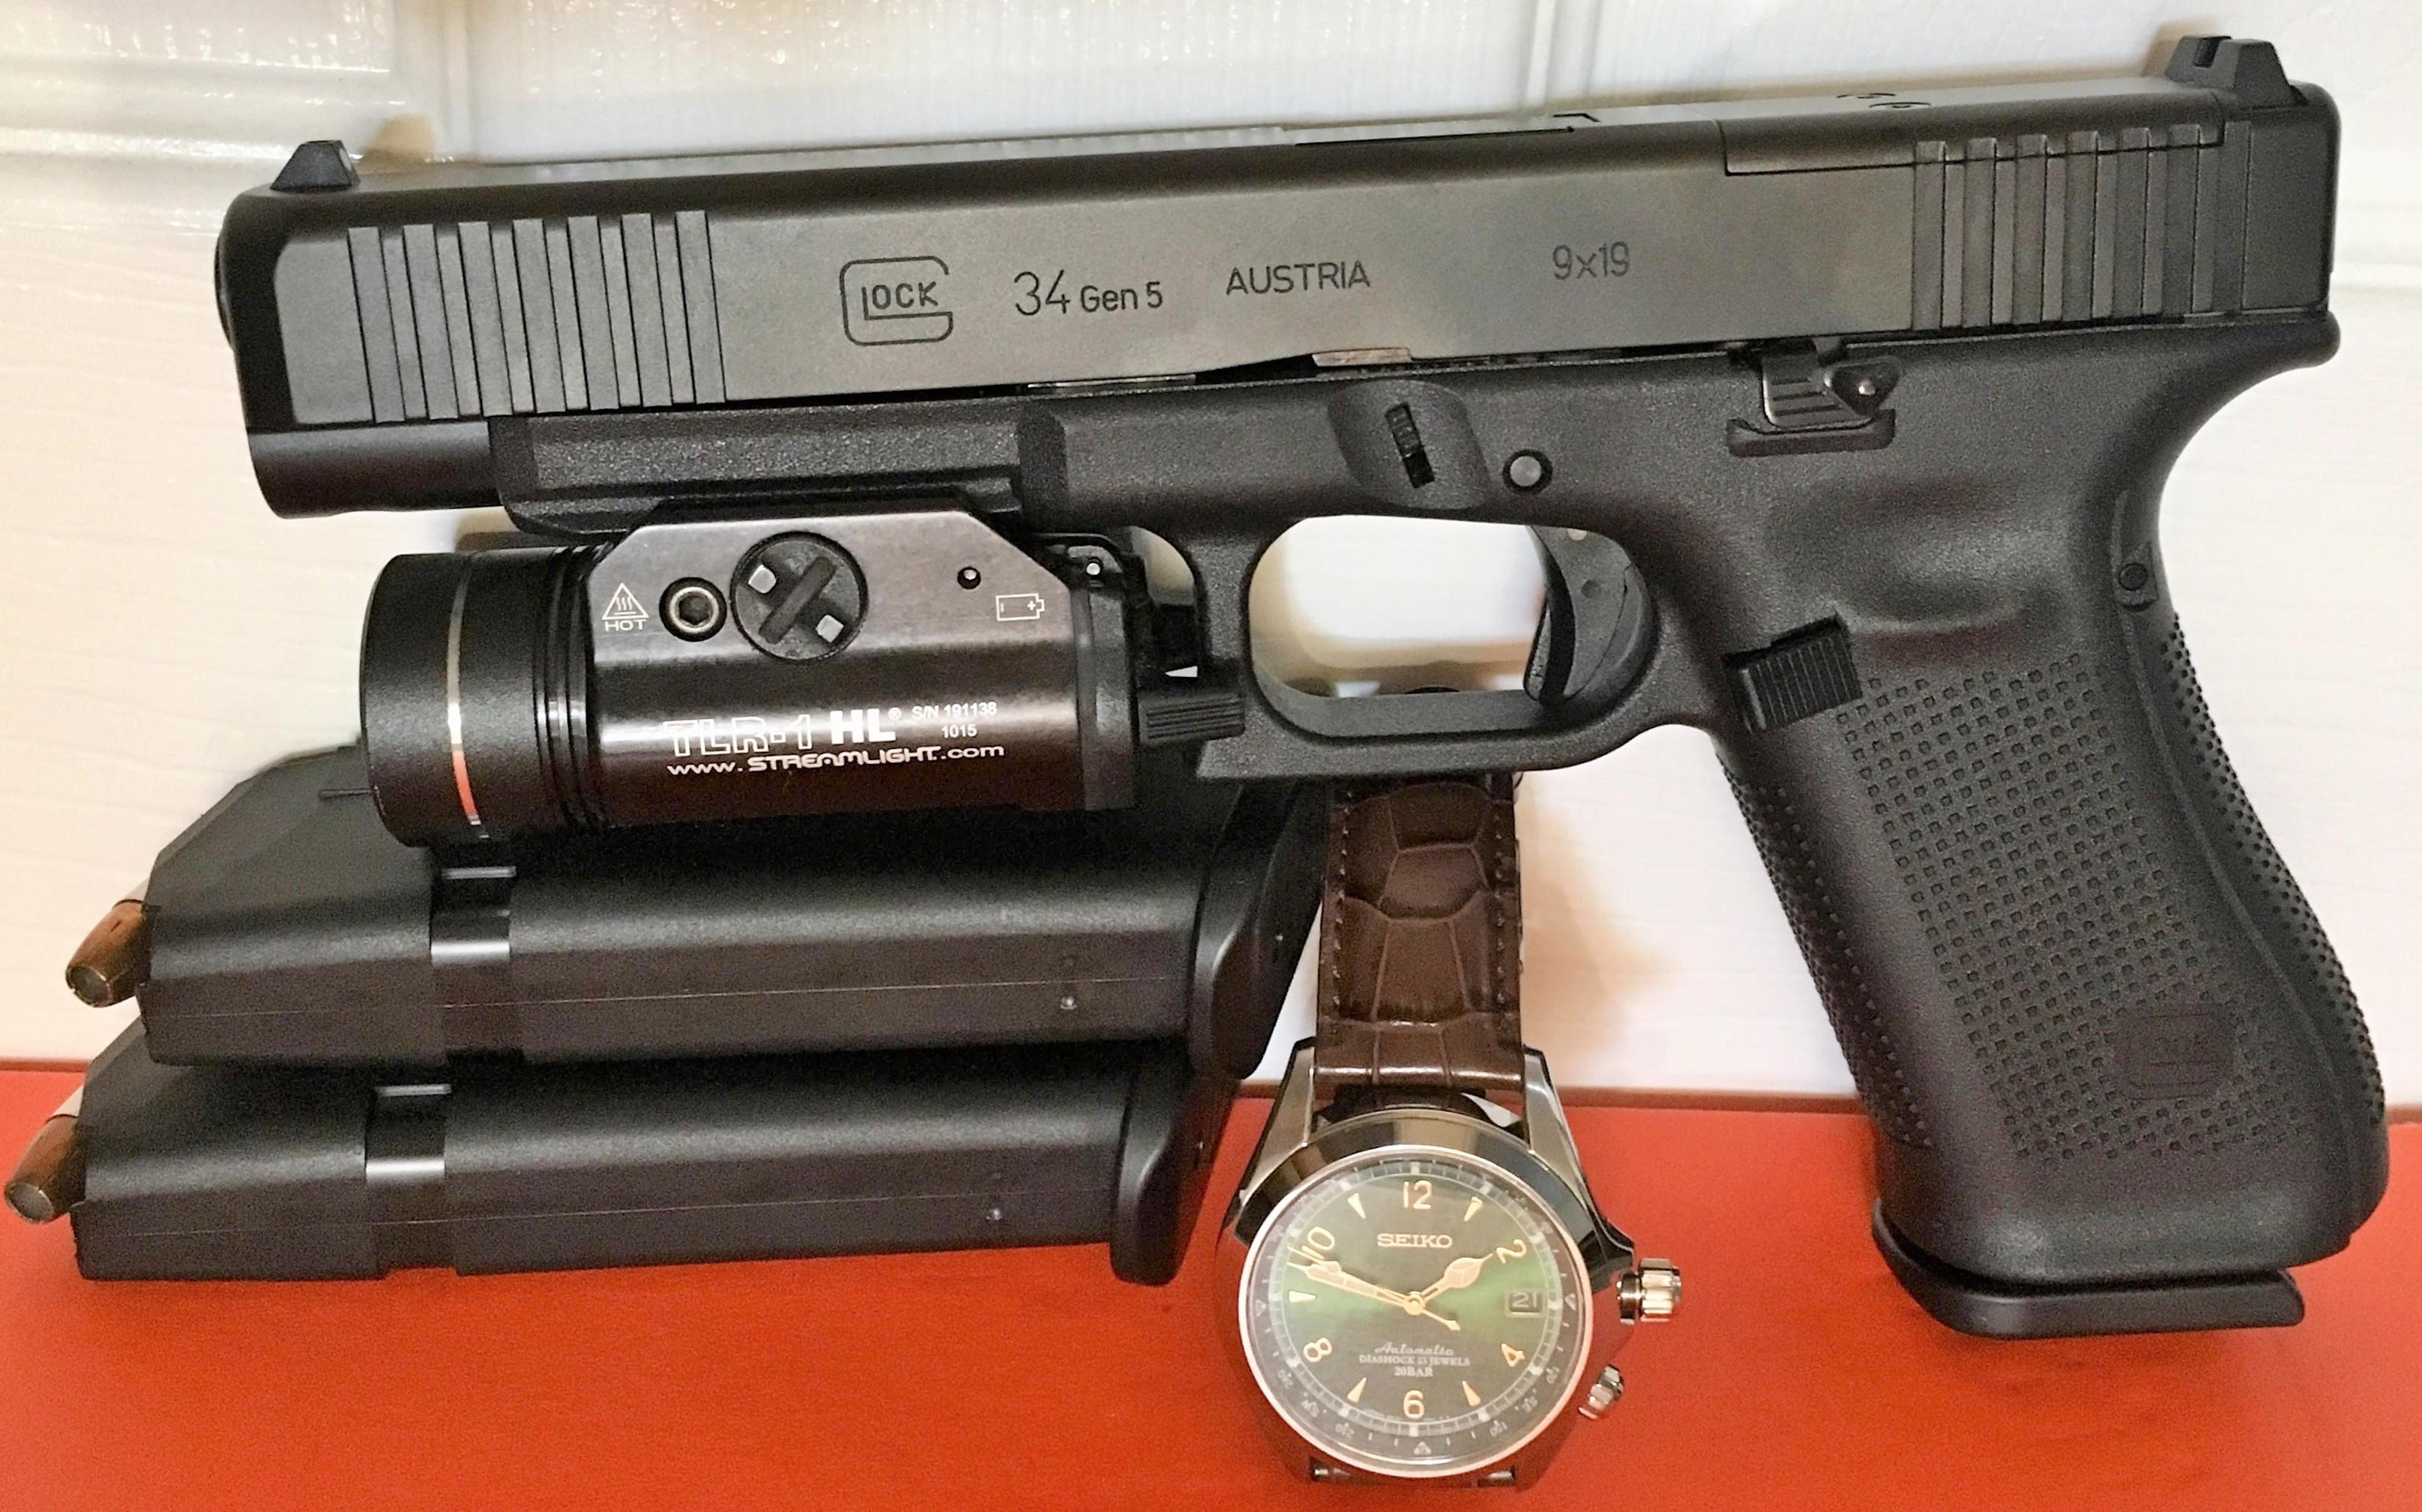 Gen5 Glock 34 Forward Serrations